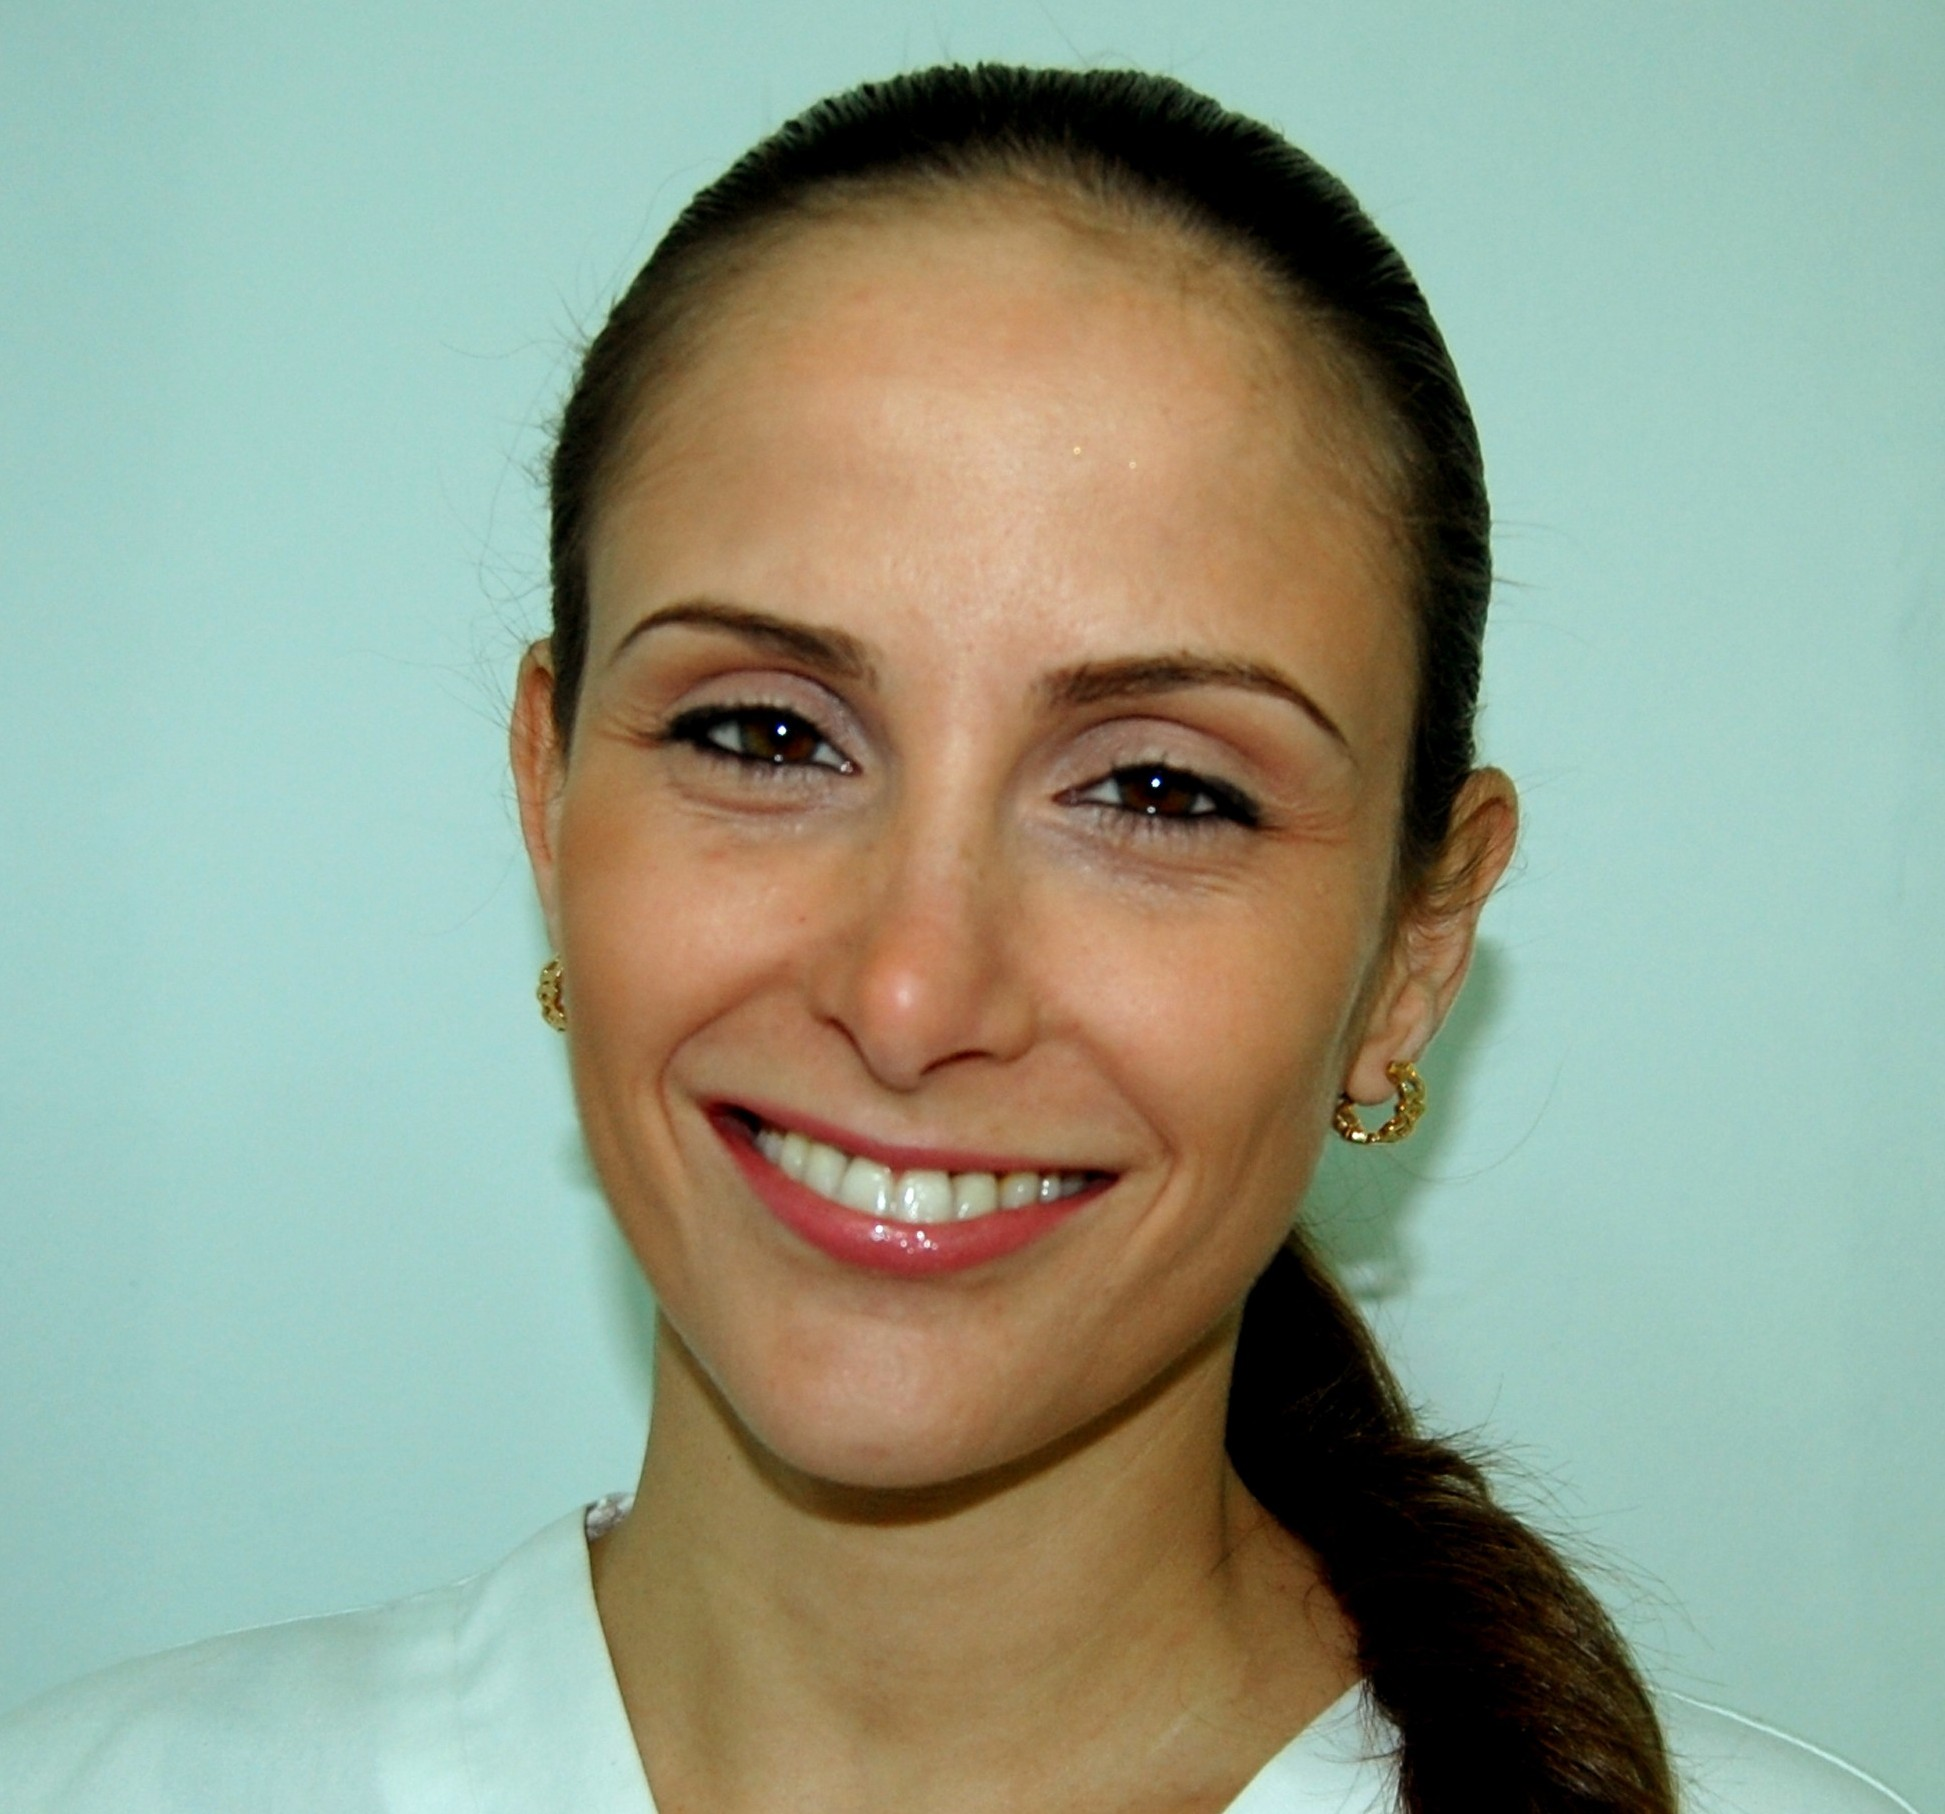 Odontóloga Carolina Menéndez